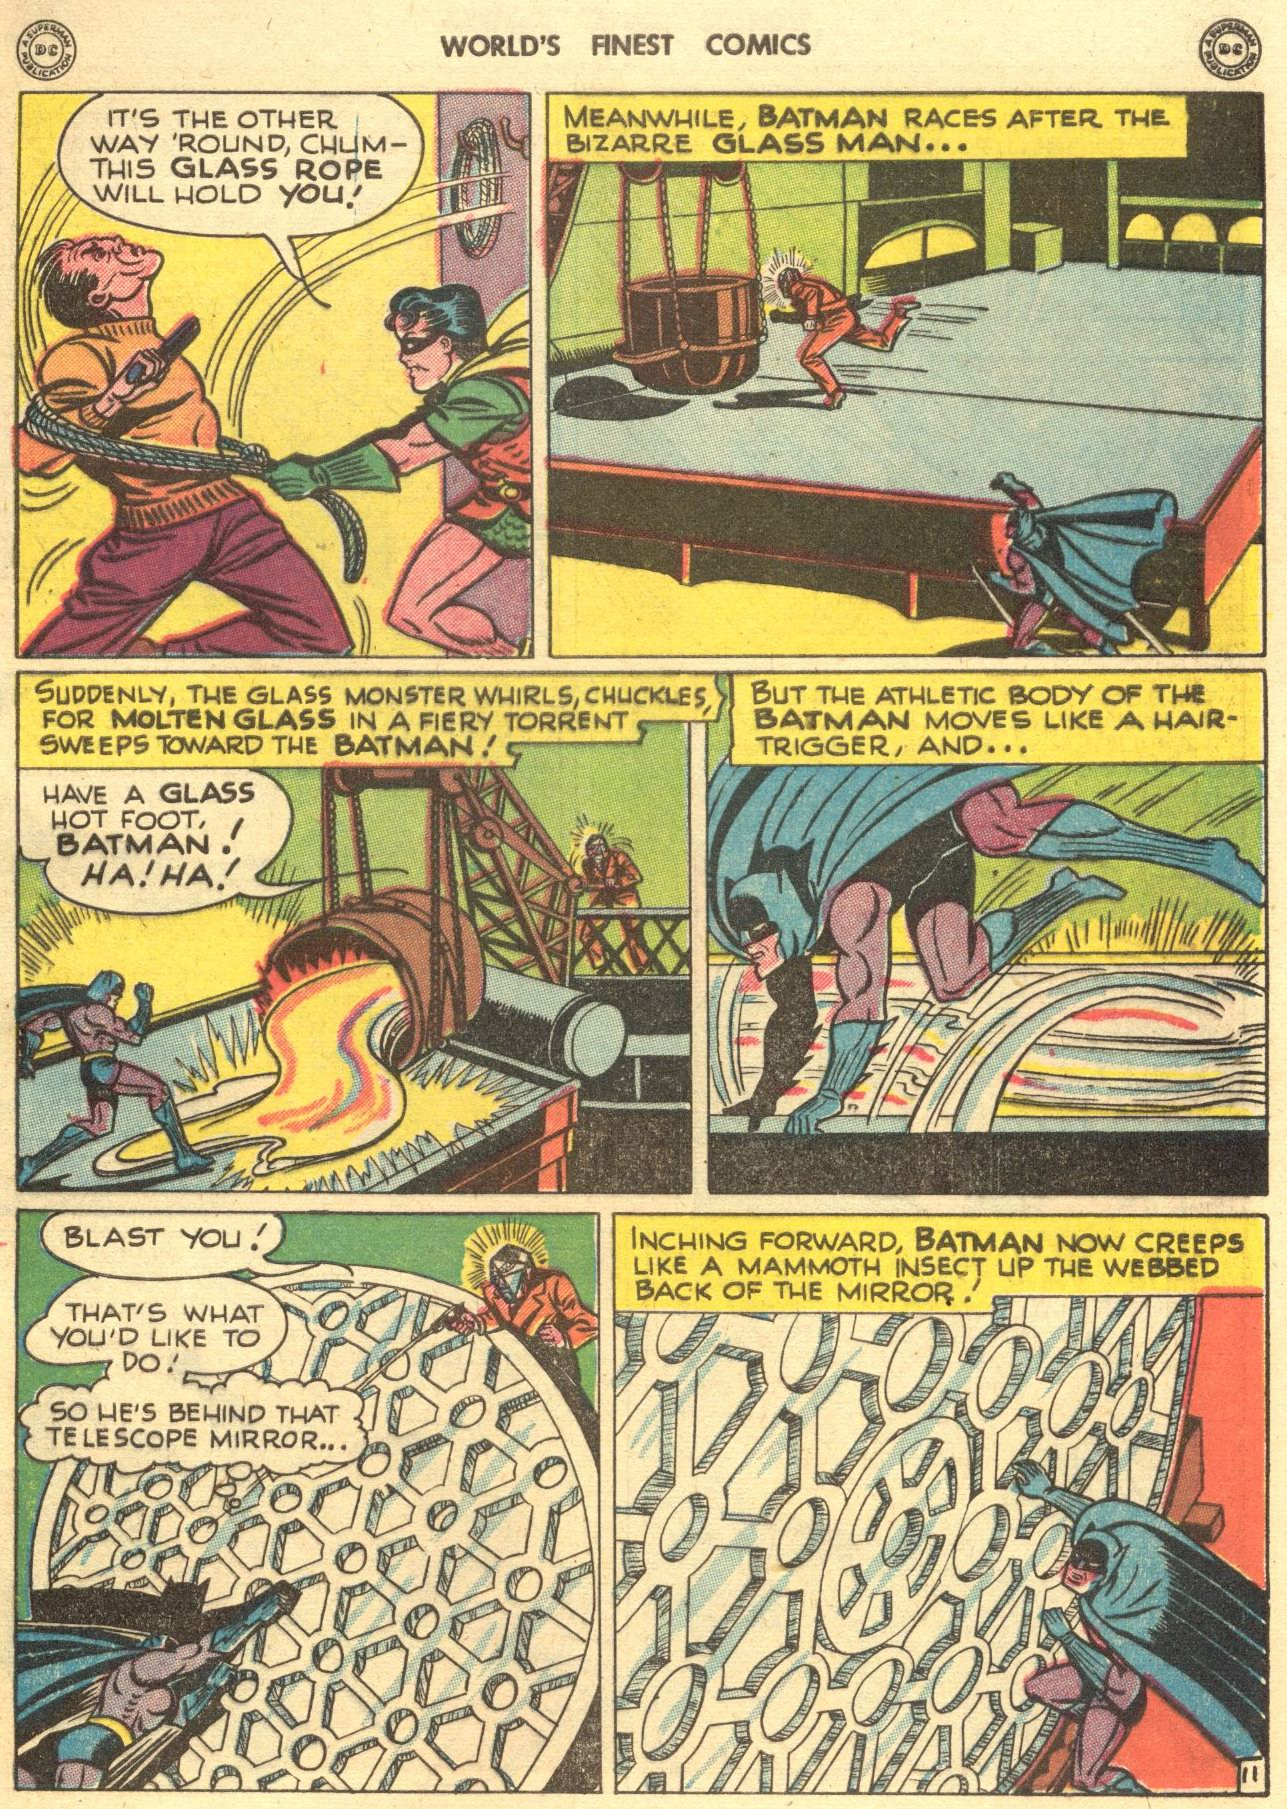 Read online World's Finest Comics comic -  Issue #28 - 70